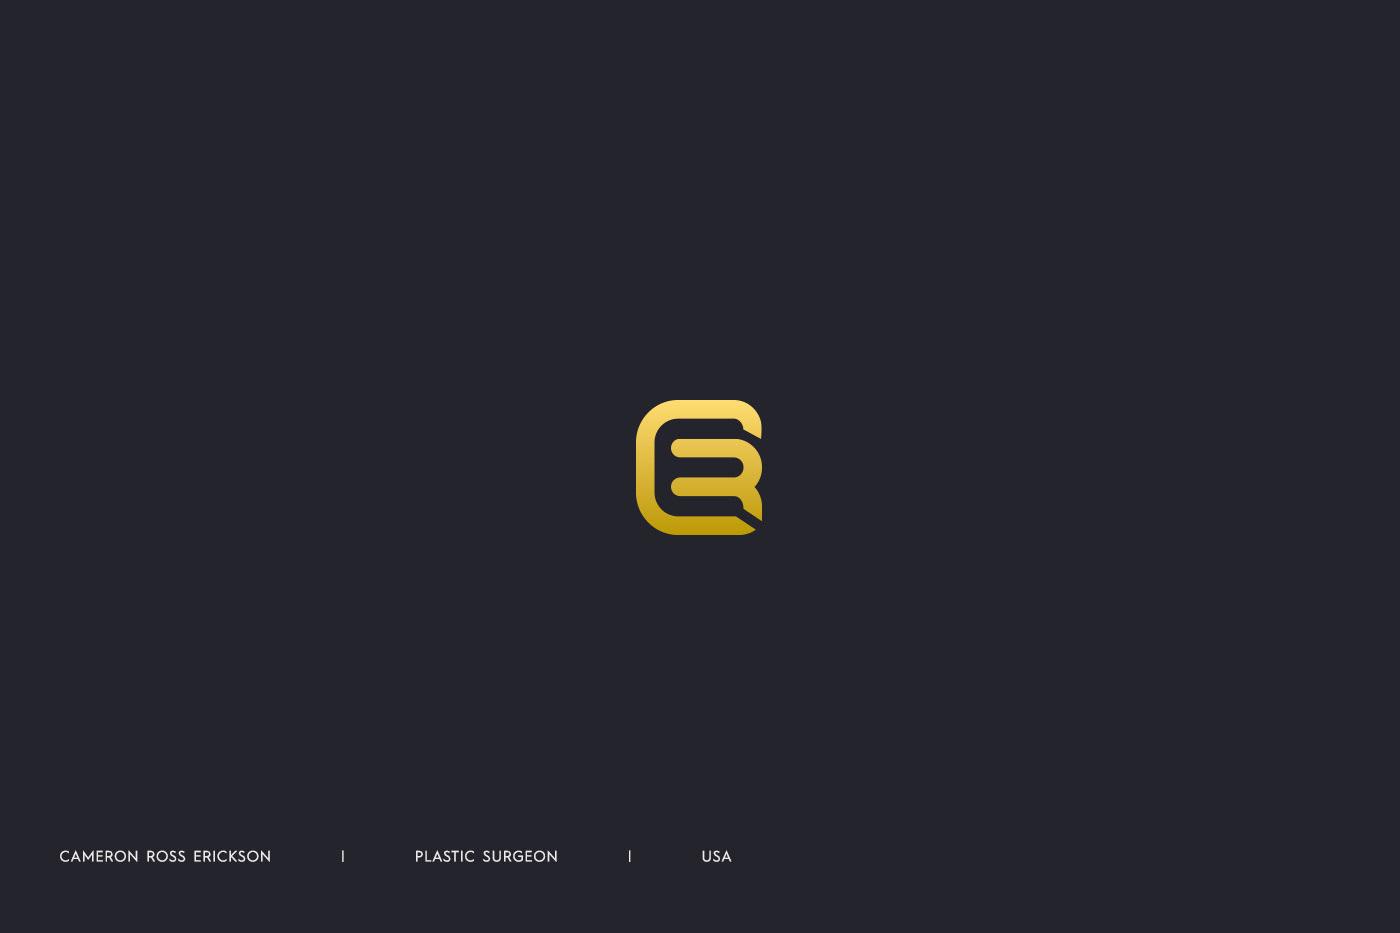 letter monogram negativespace simple minimal samadaraginige samadara logo design clever